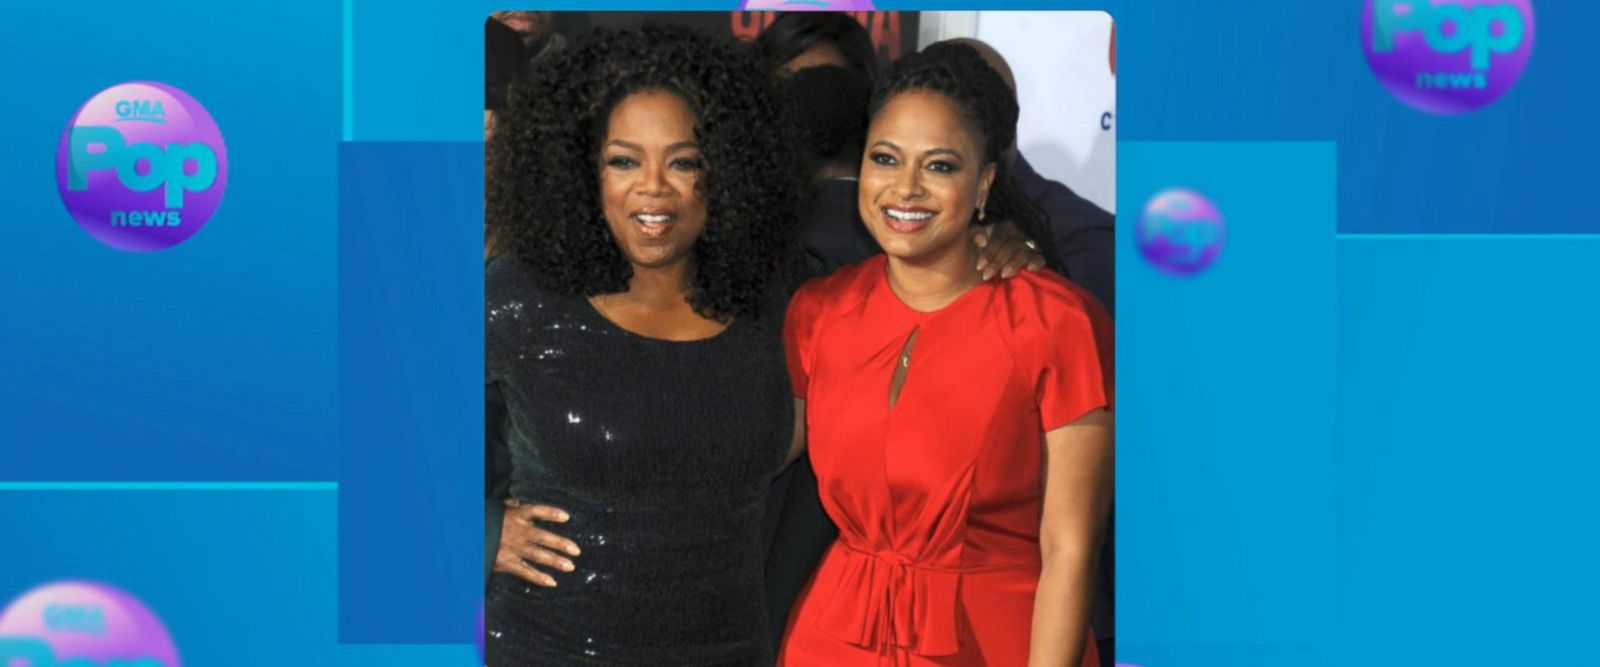 VIDEO: Ava Duvernay partners with Oprah Winfrey's production company